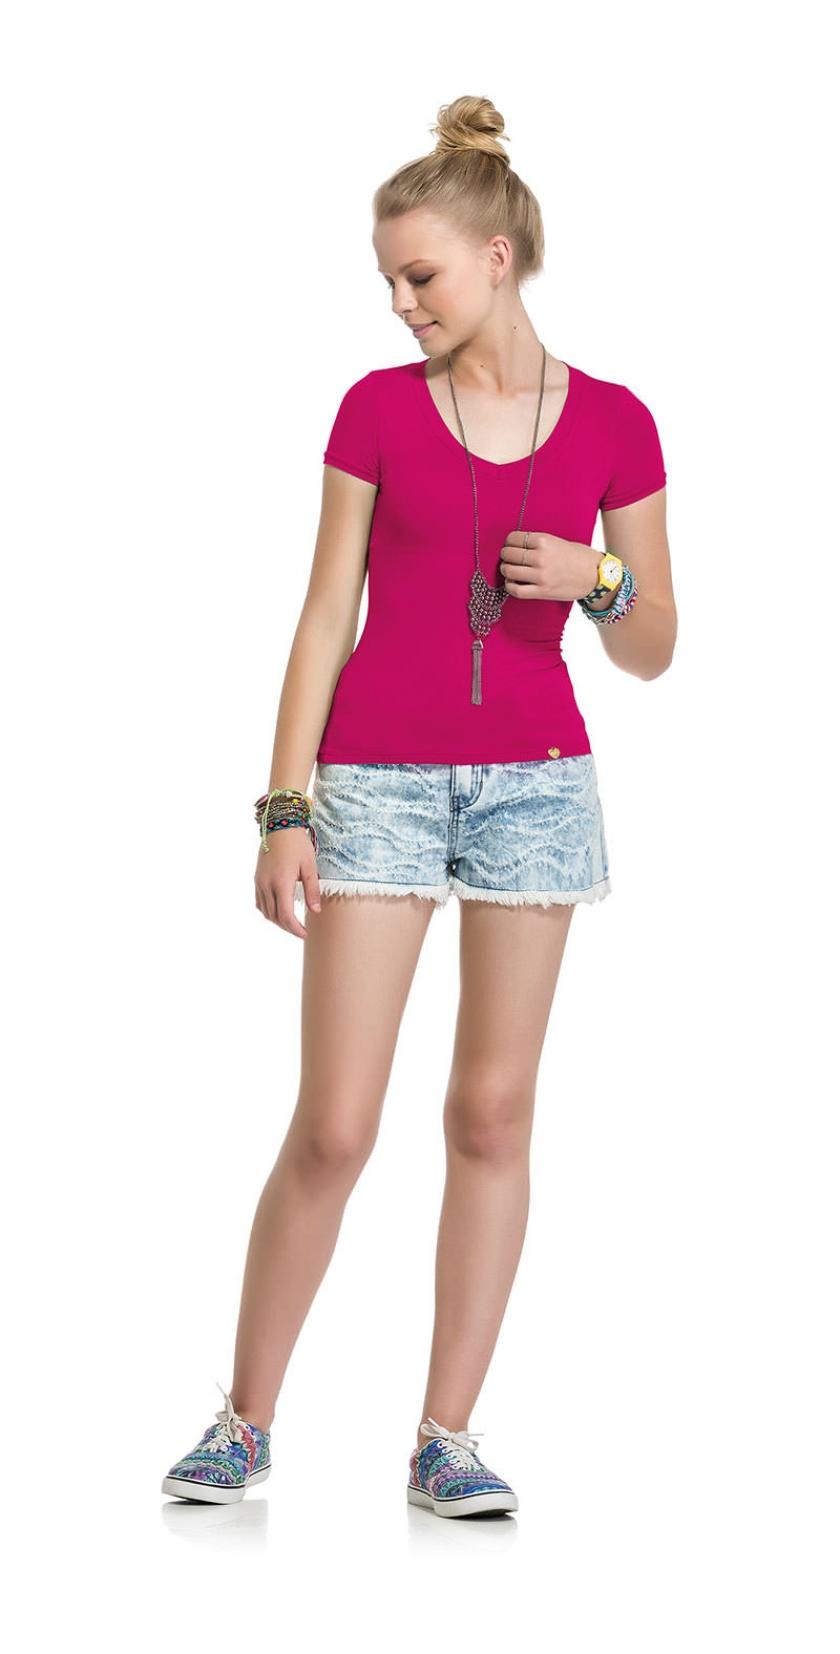 2d4b5e852 Look 1571 - Juvenil Hits - Blusas - Primavera Verão 2016 - Lunender